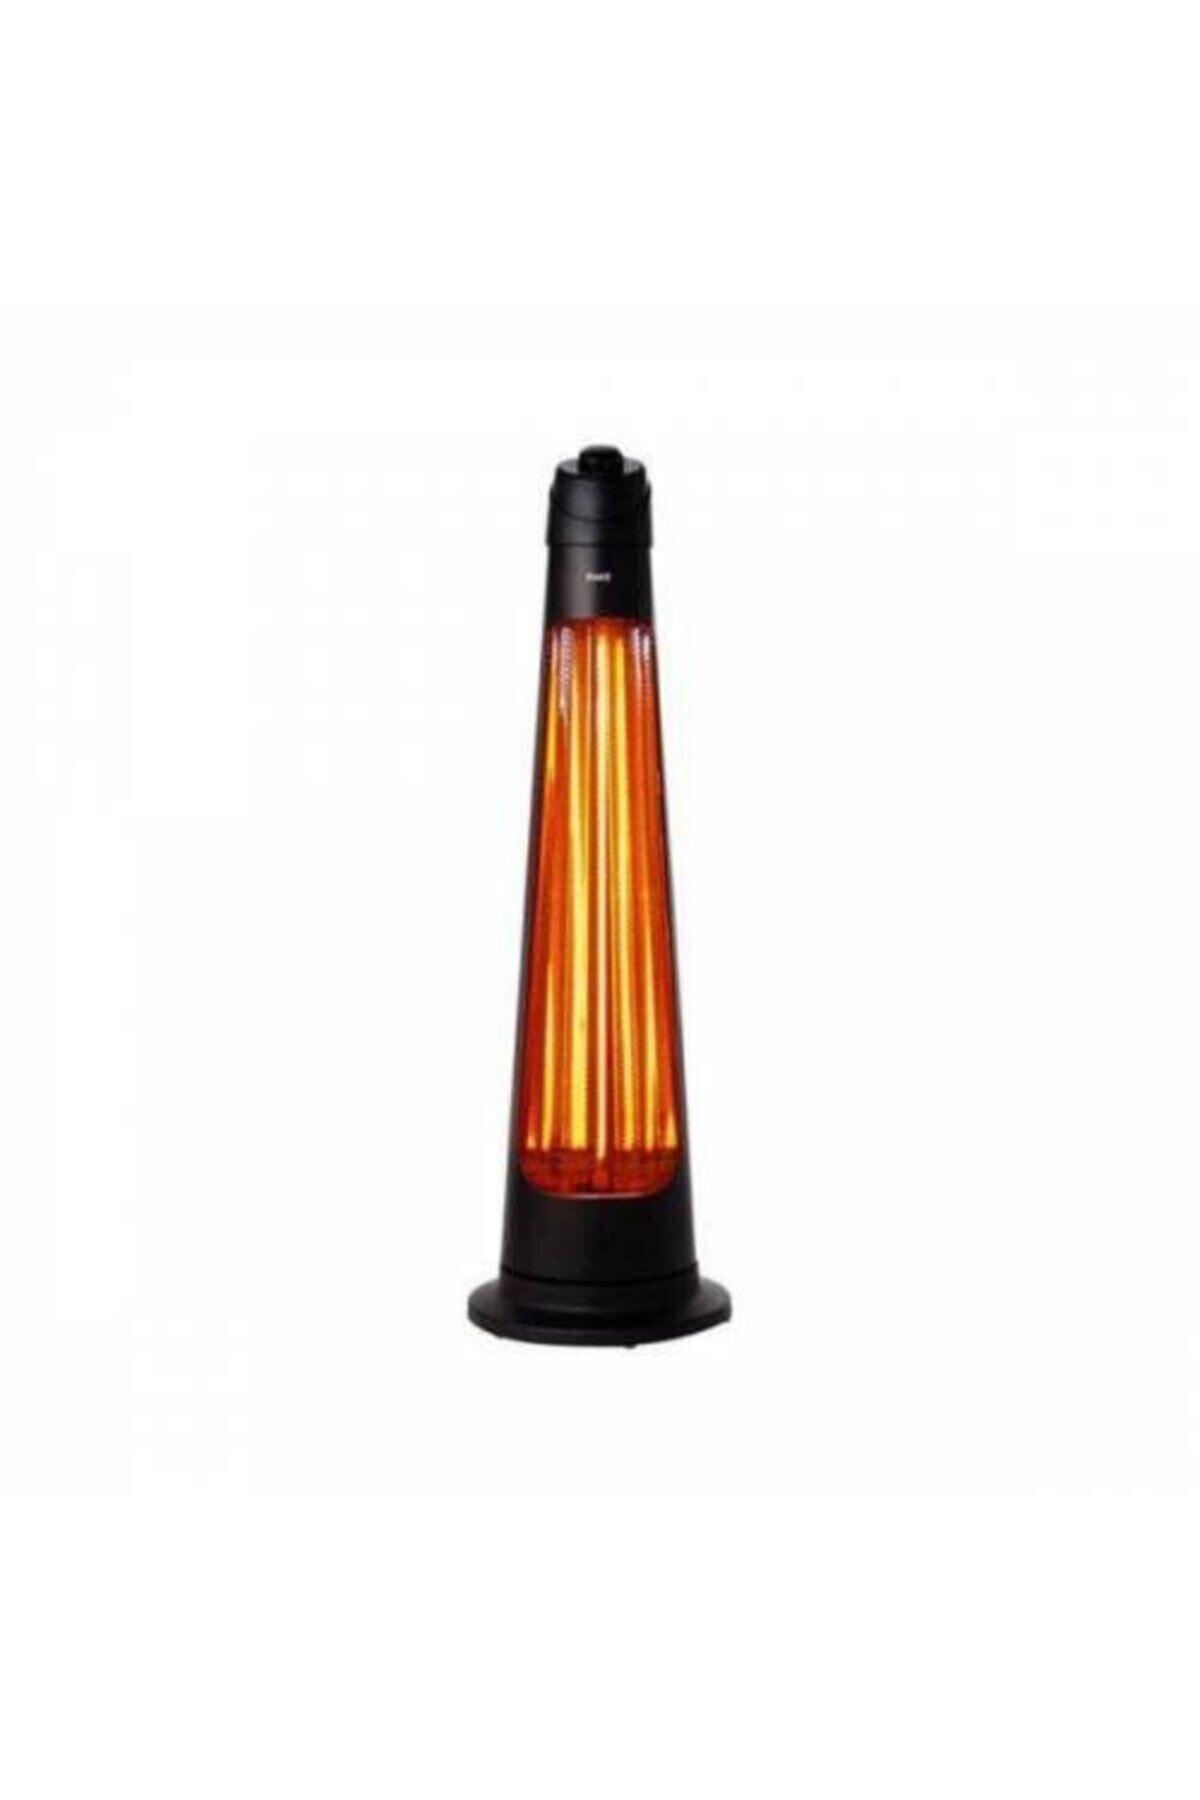 Raks A1200 Adalya Kule Tipi Karbon Isıtıcı - 1200w 1